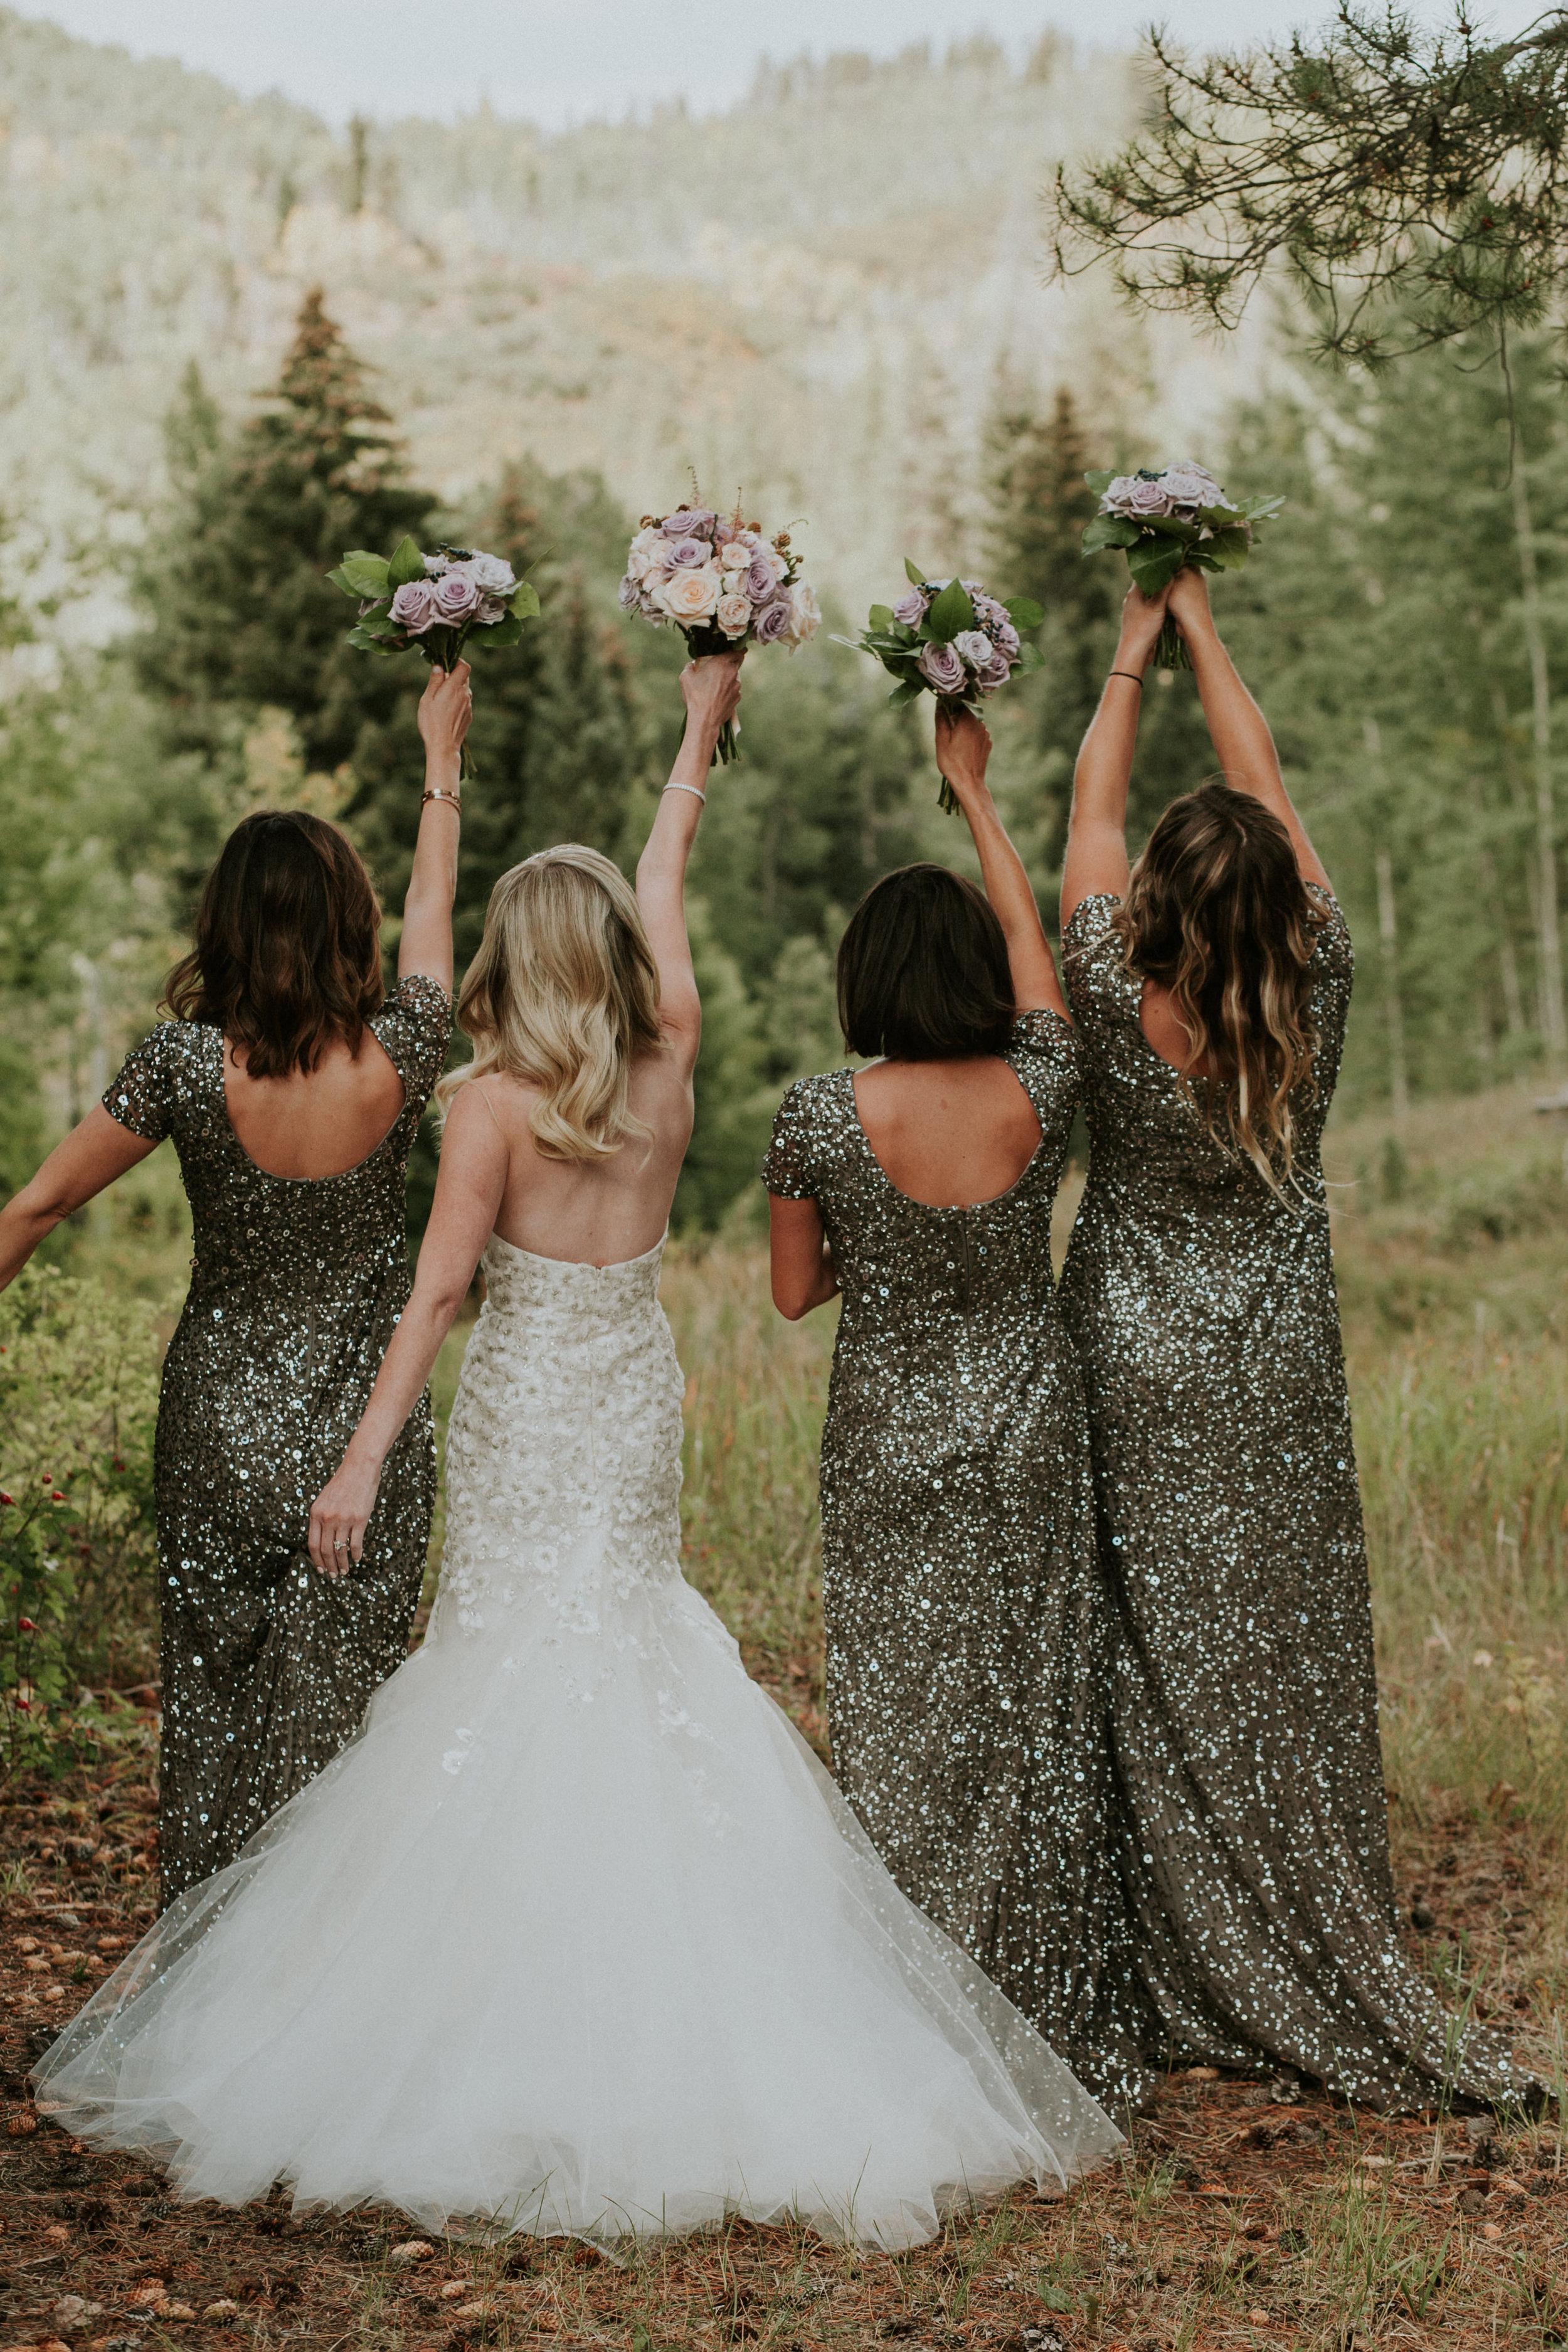 bridal_party_016.jpg